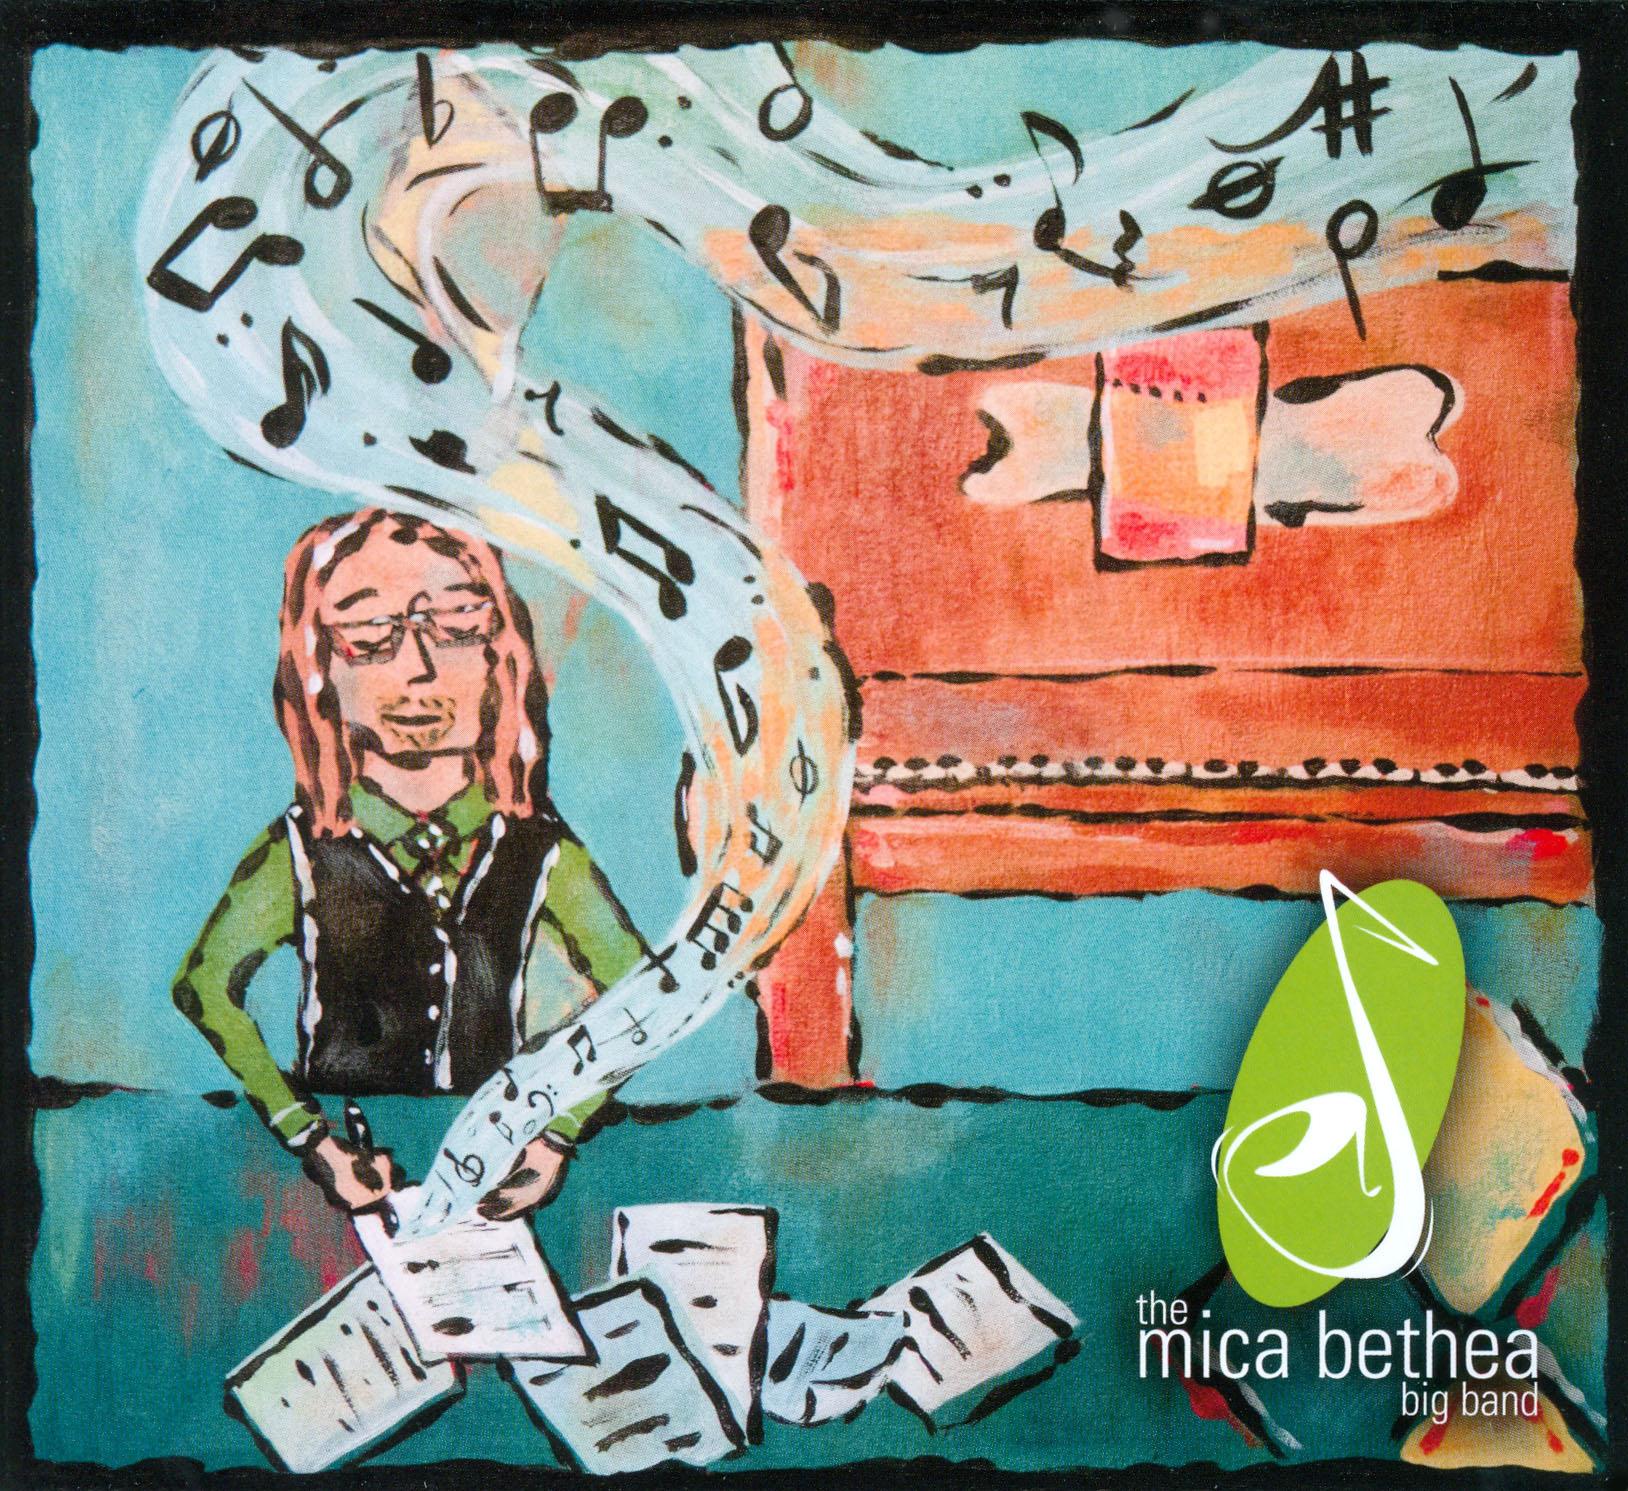 The Mica Bethea Big Band